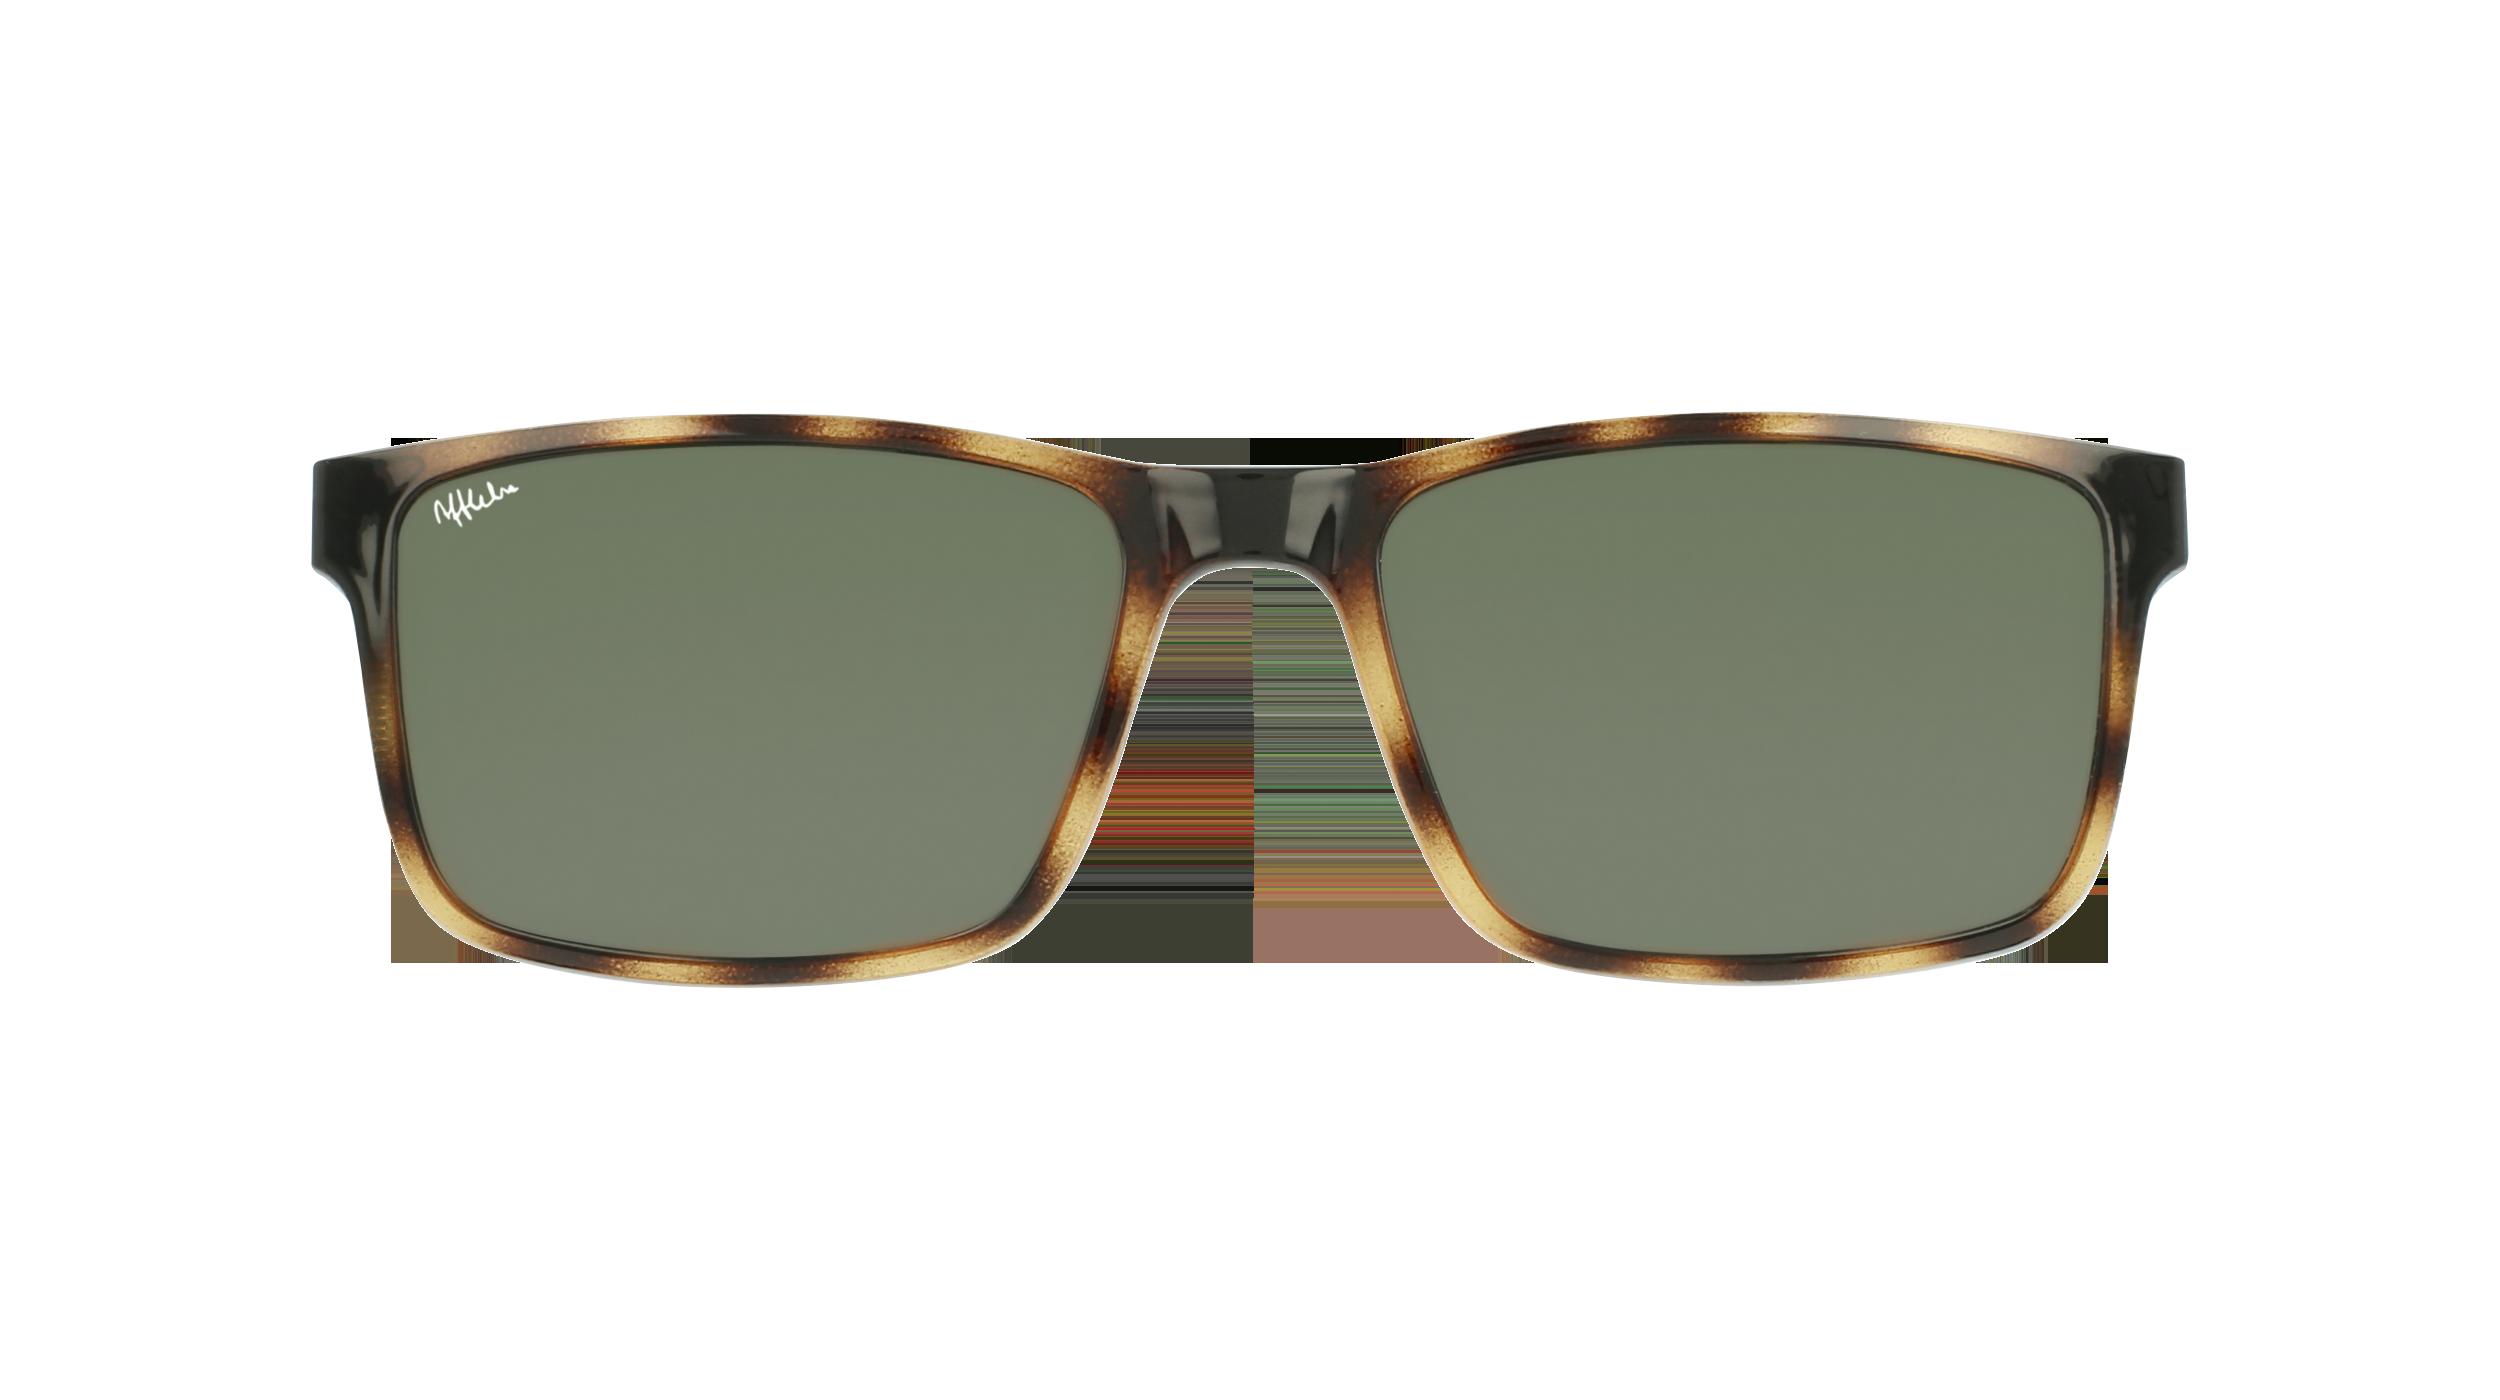 afflelou/france/products/smart_clip/clips_glasses/07630036457436.png